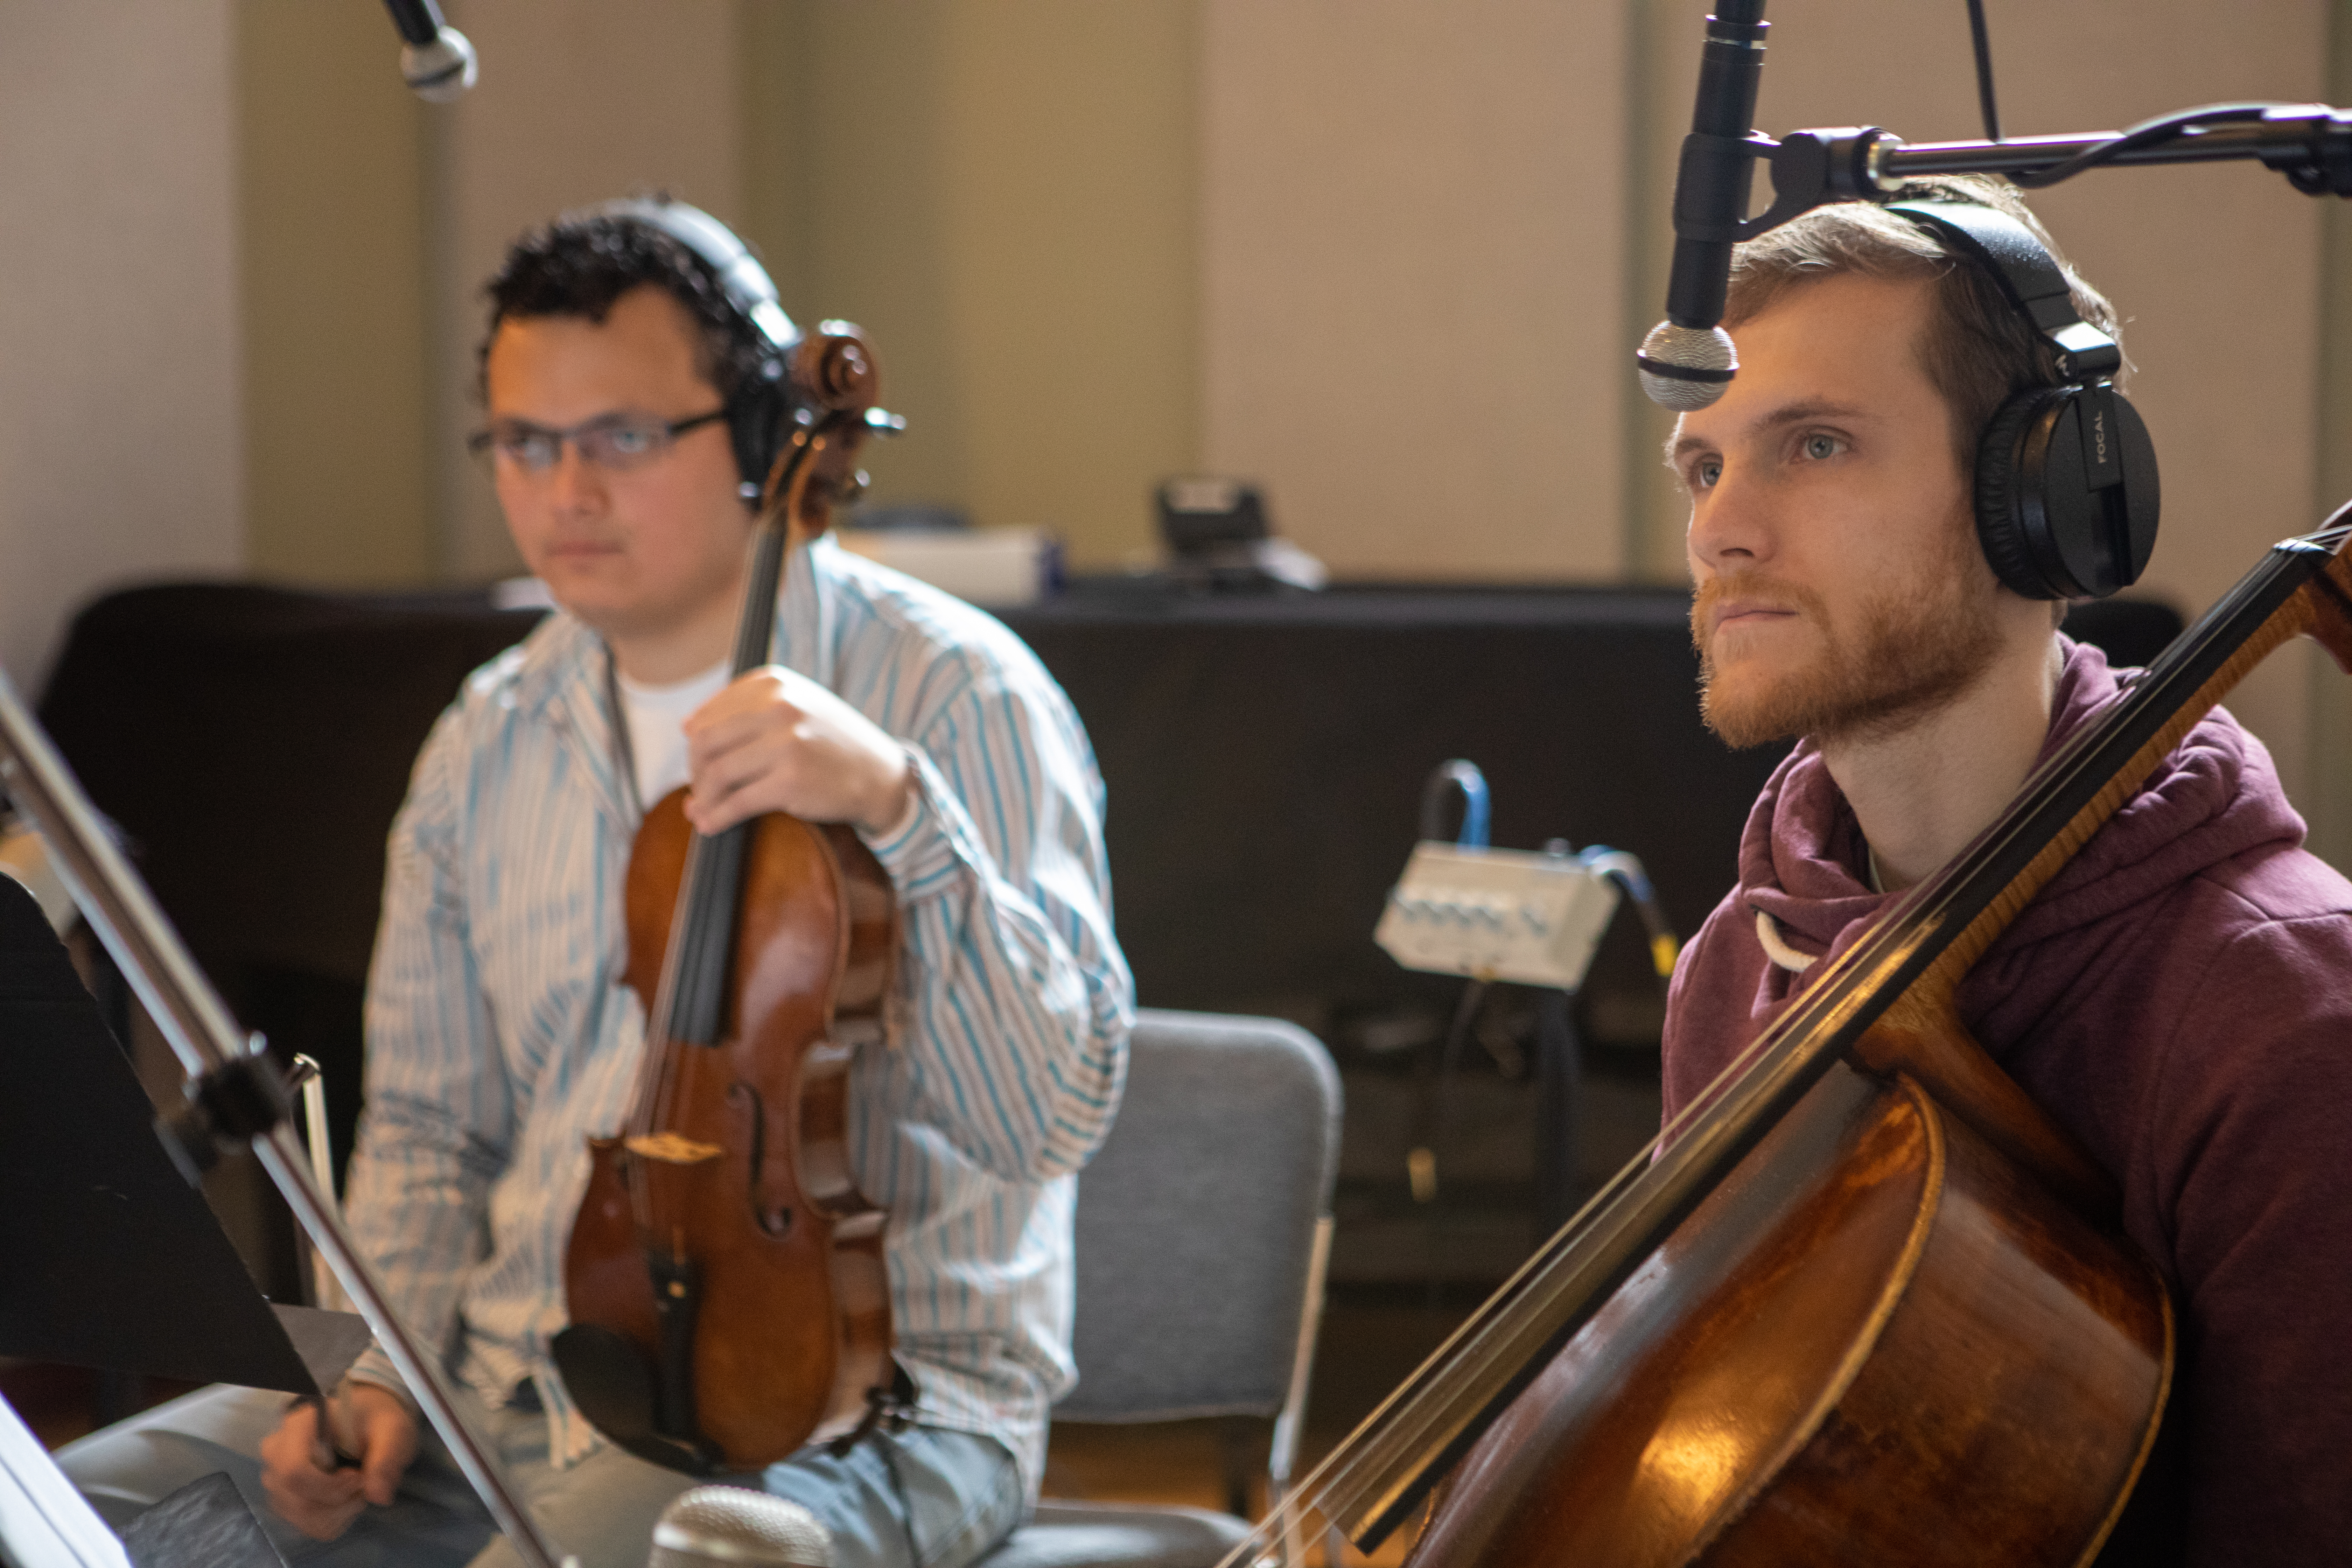 Strings Day for The Love Bugs score, Mario Rivera violist, Eric Haugen cellist